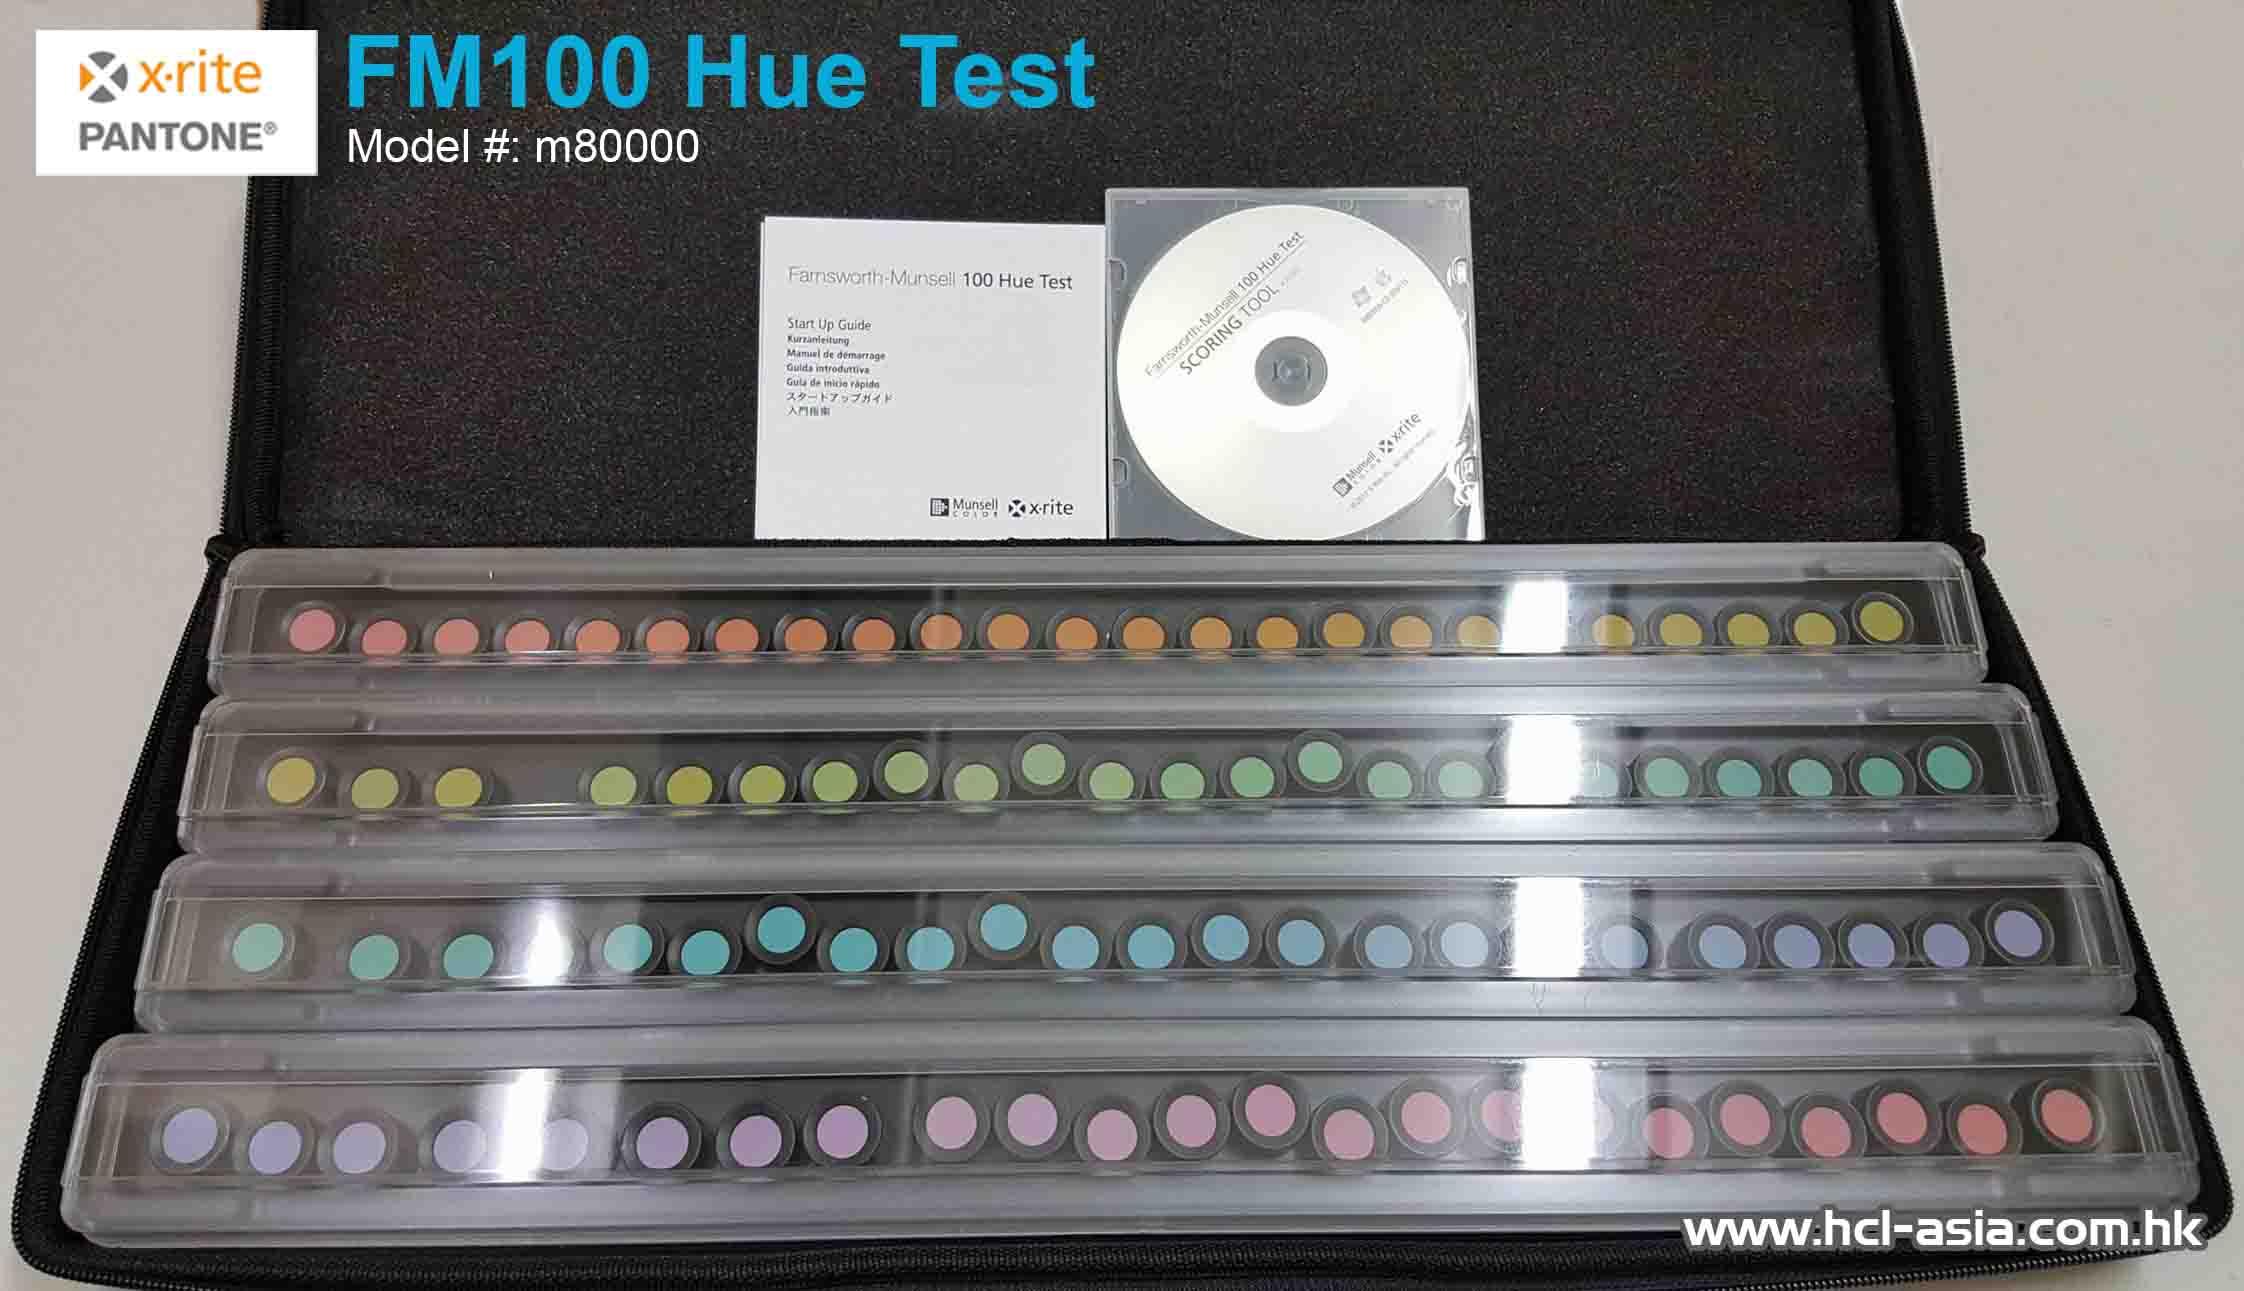 farnsworth munsell 100 hue test